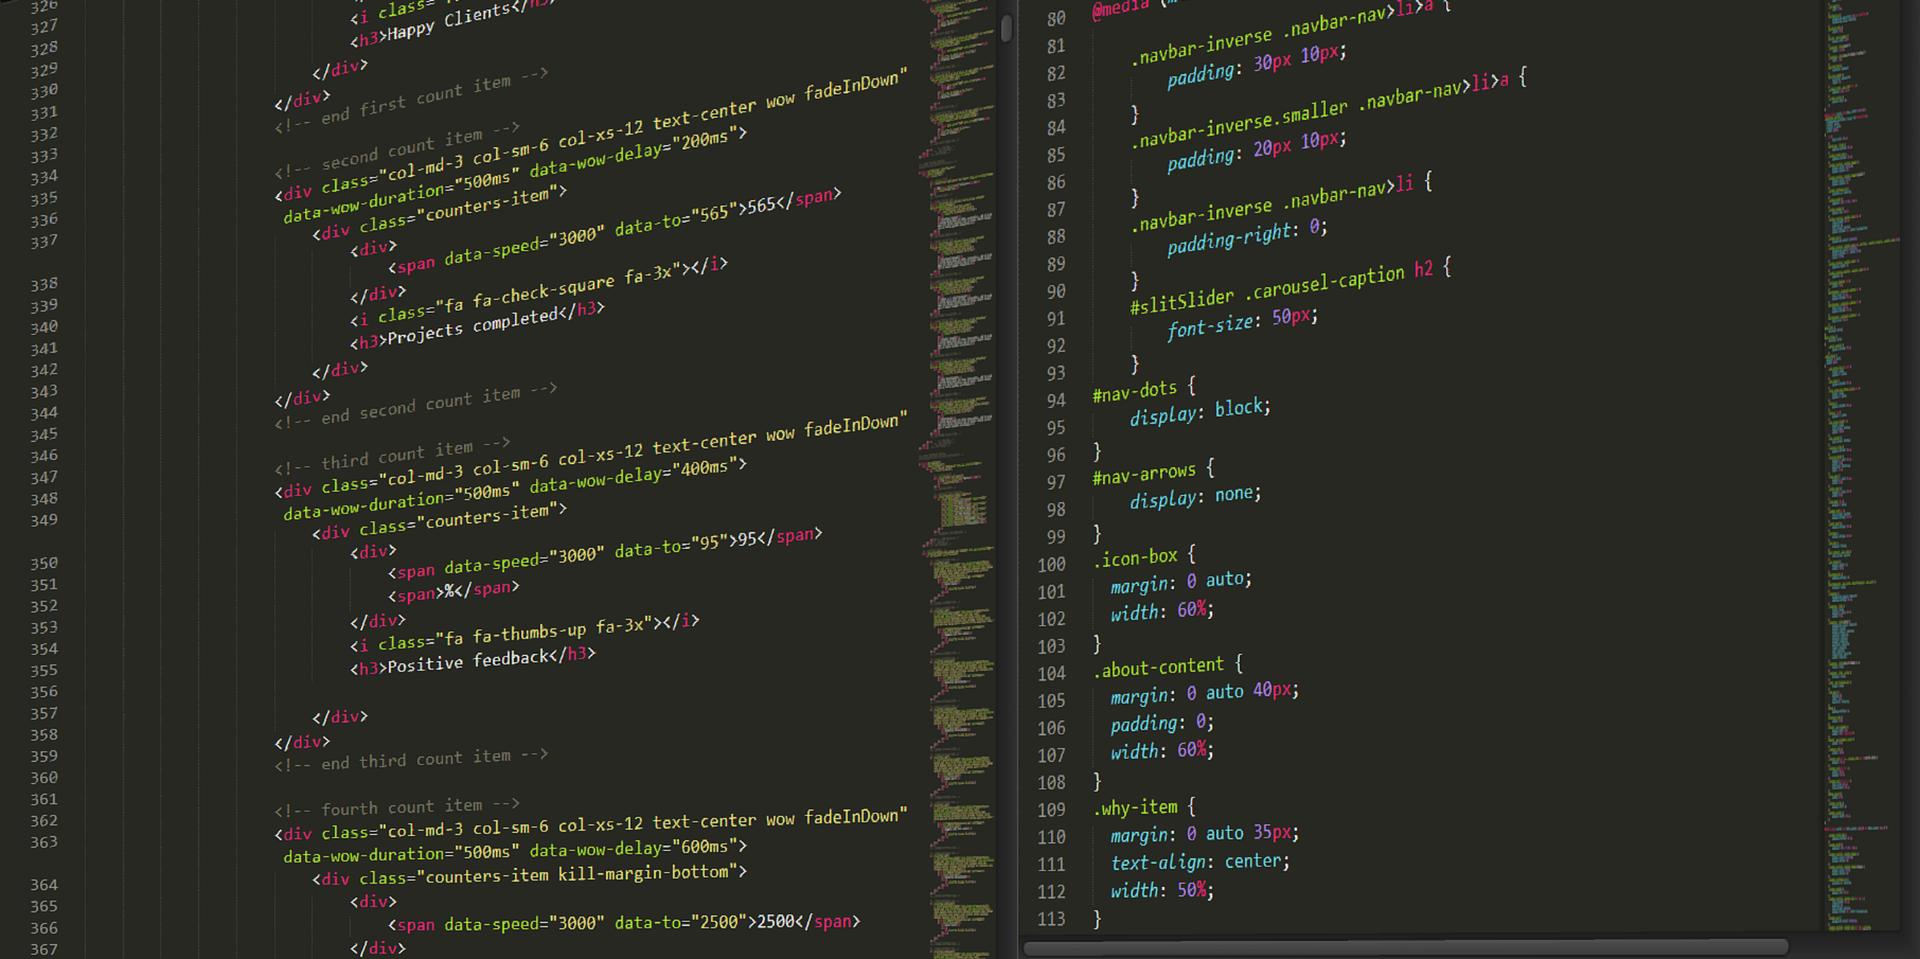 background image of code